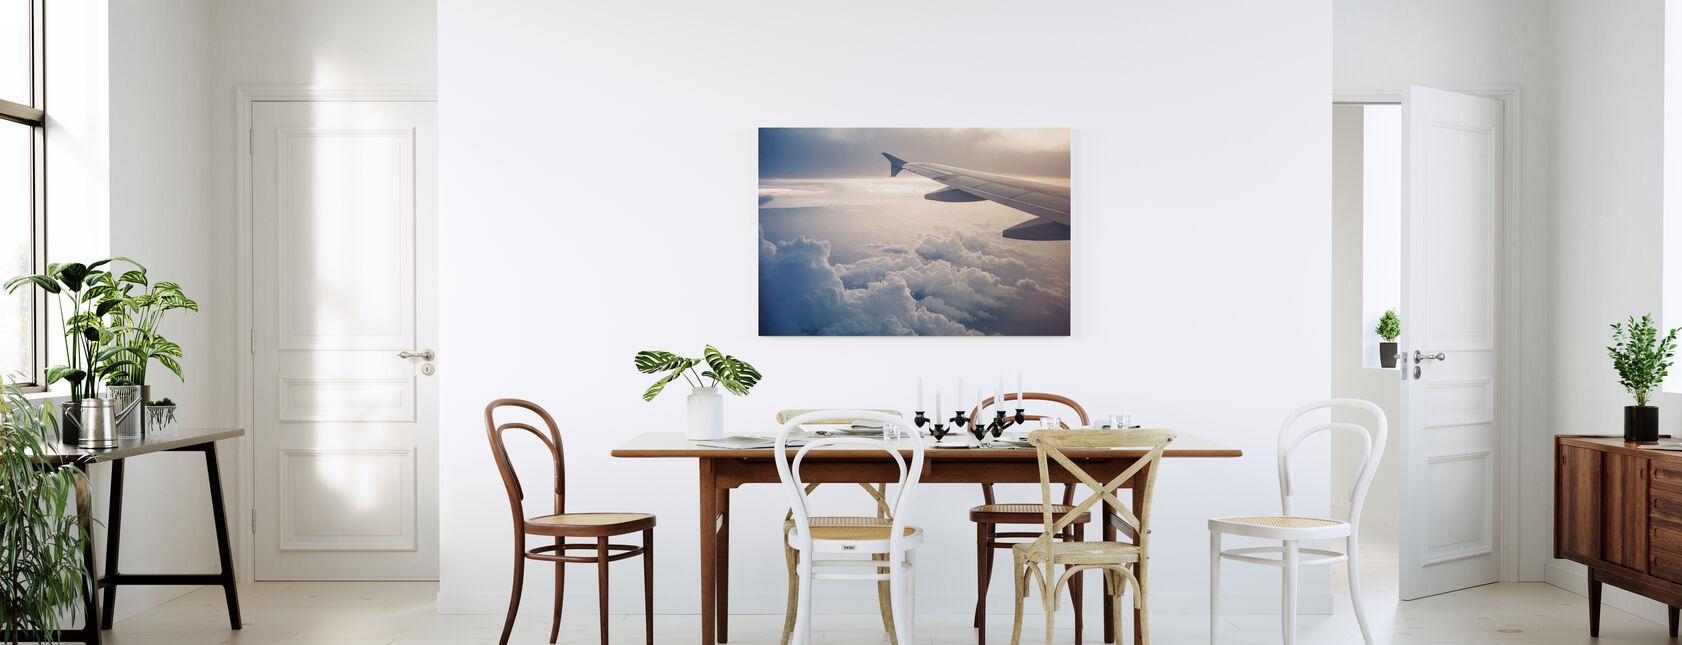 Wing - Canvas print - Kitchen